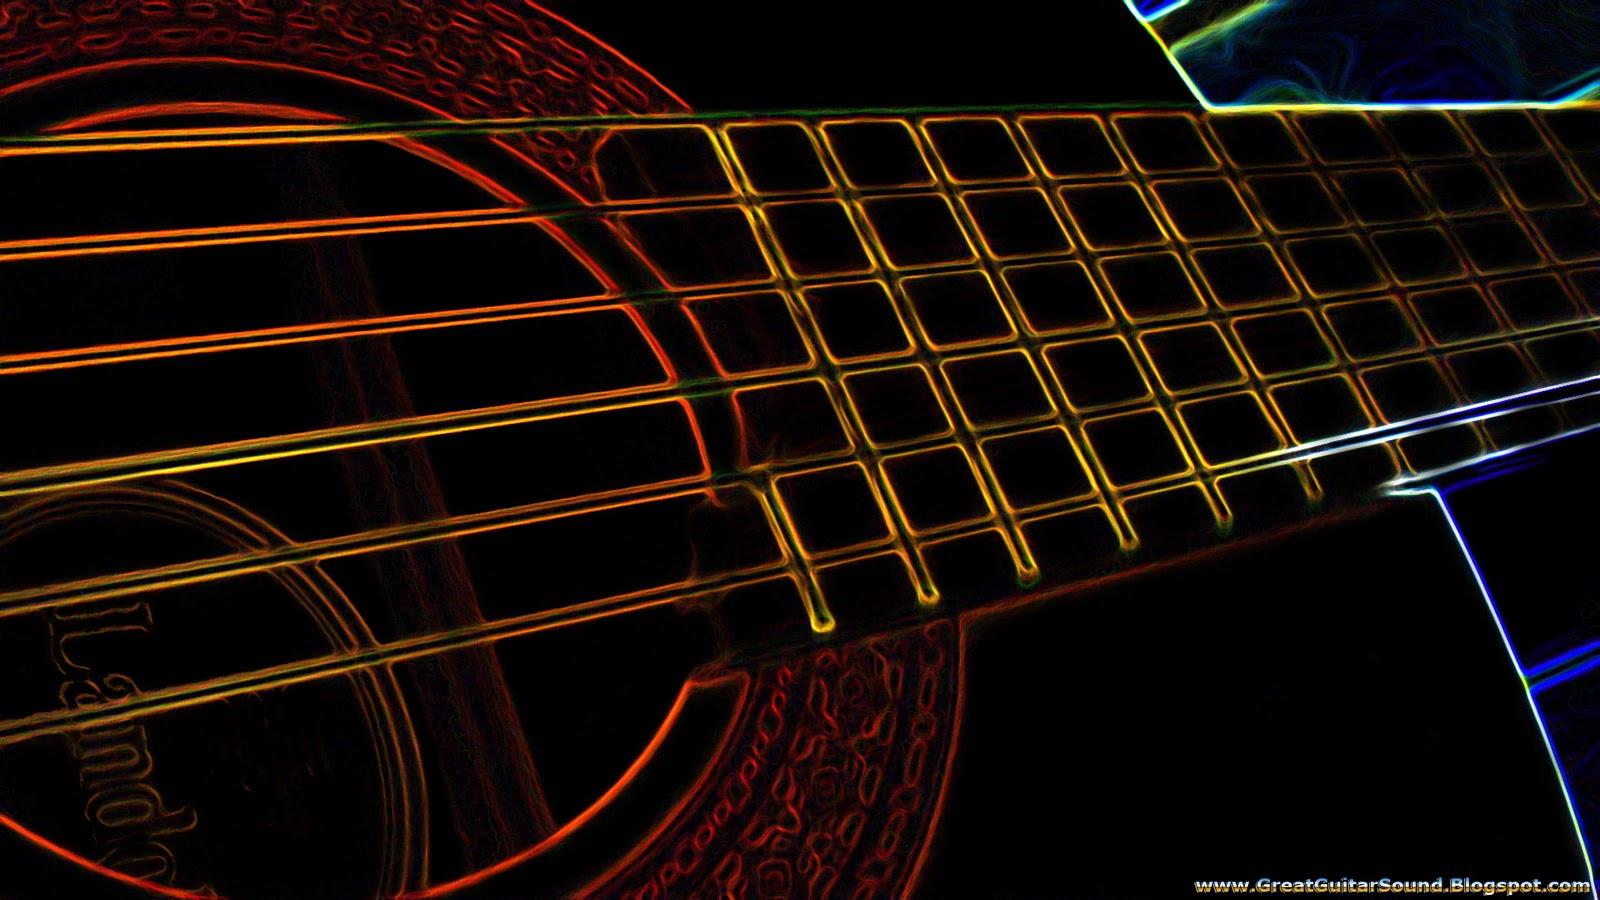 Wallpaper   Landola C 55 Classical Guitar Glowing Background HD Music 1600x900